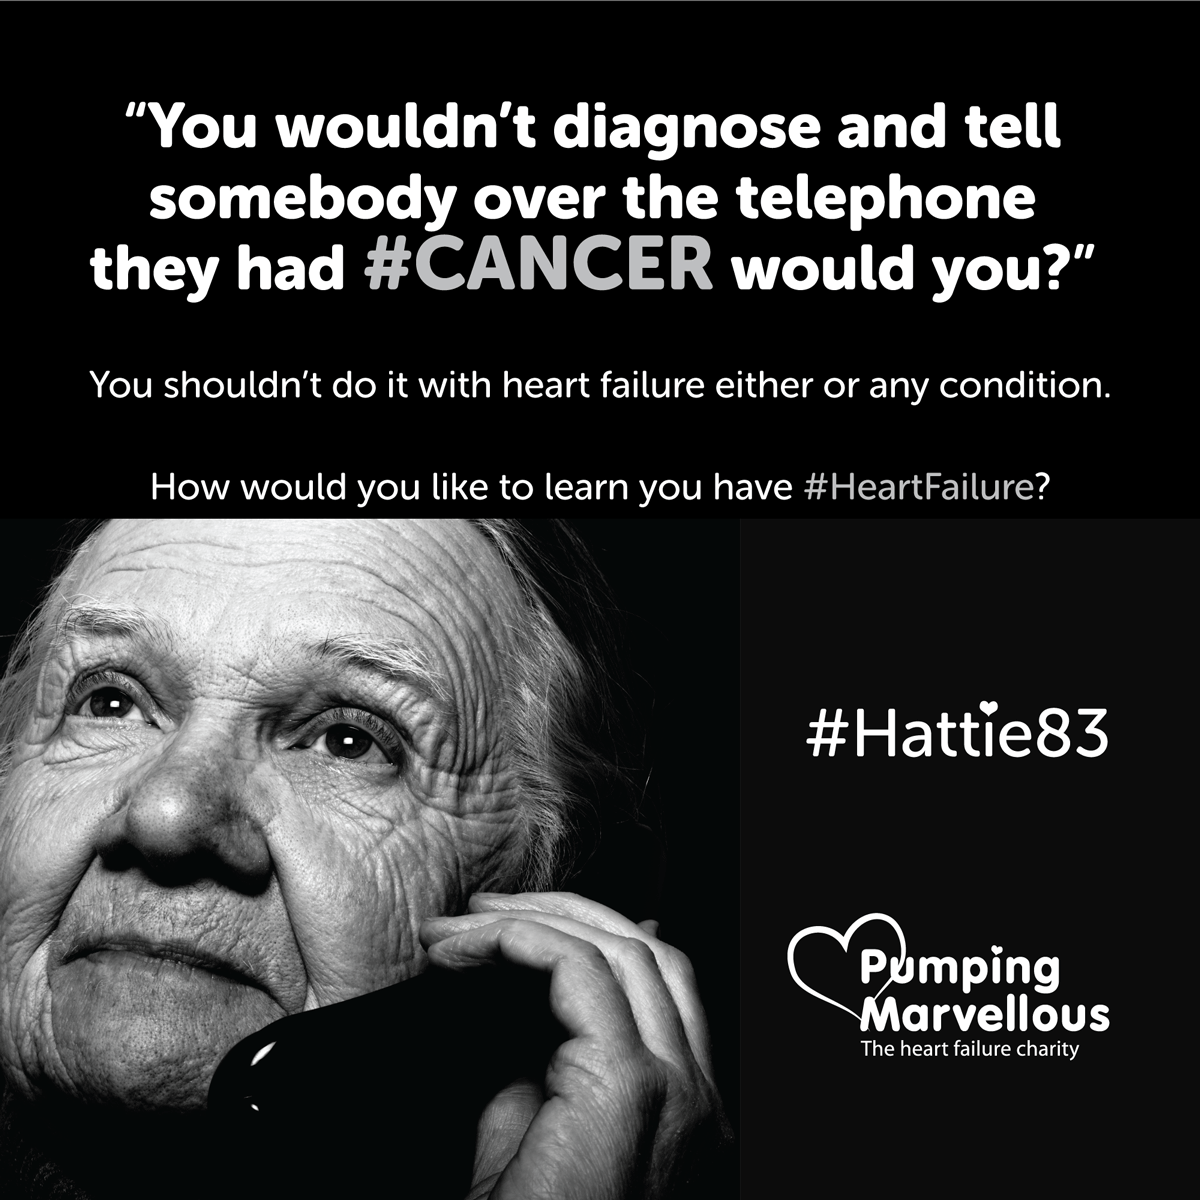 Heart Failure Diagnosis #Hattie83